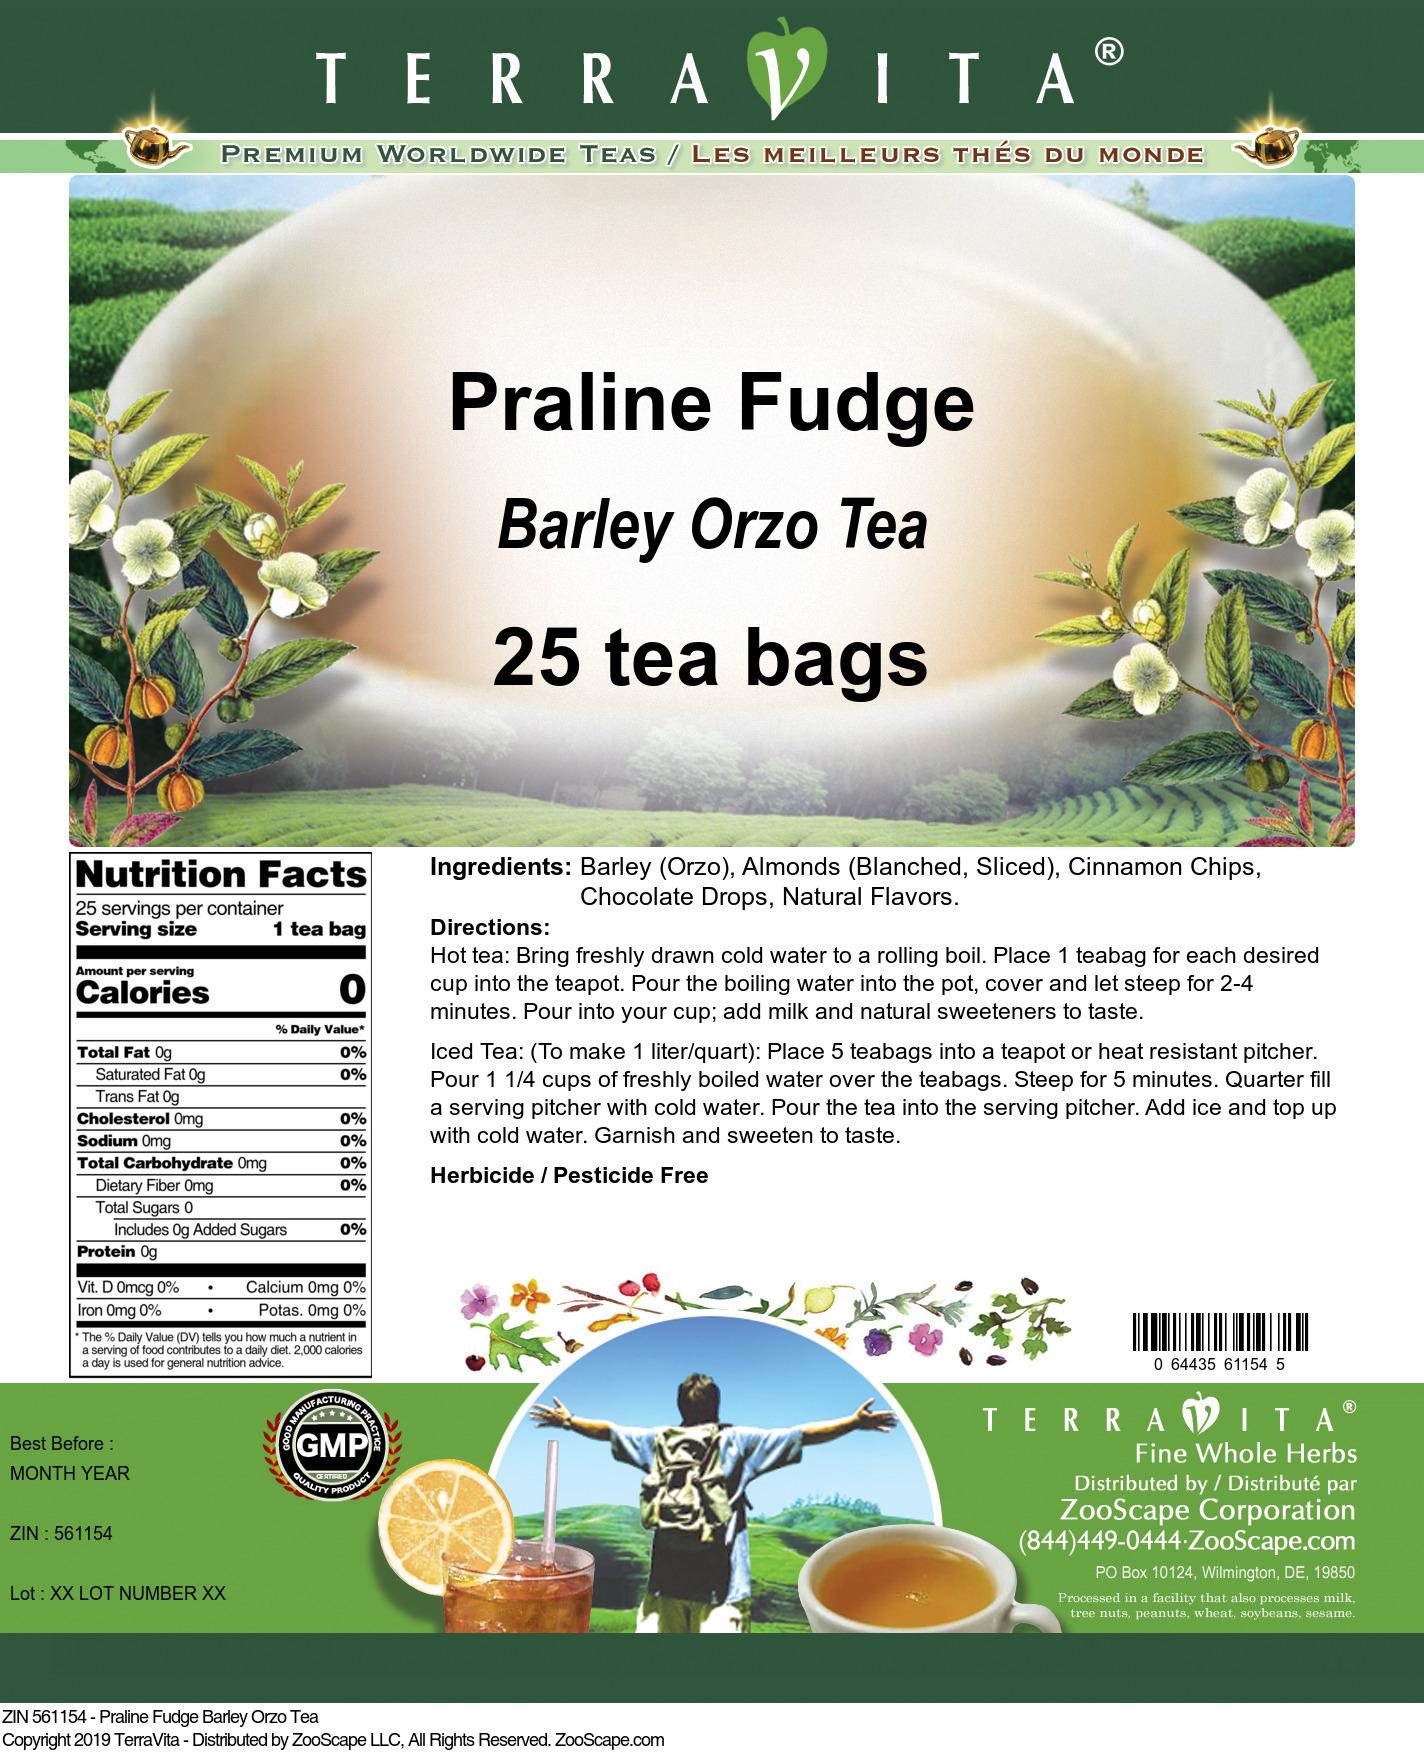 Praline Fudge Barley Orzo Tea